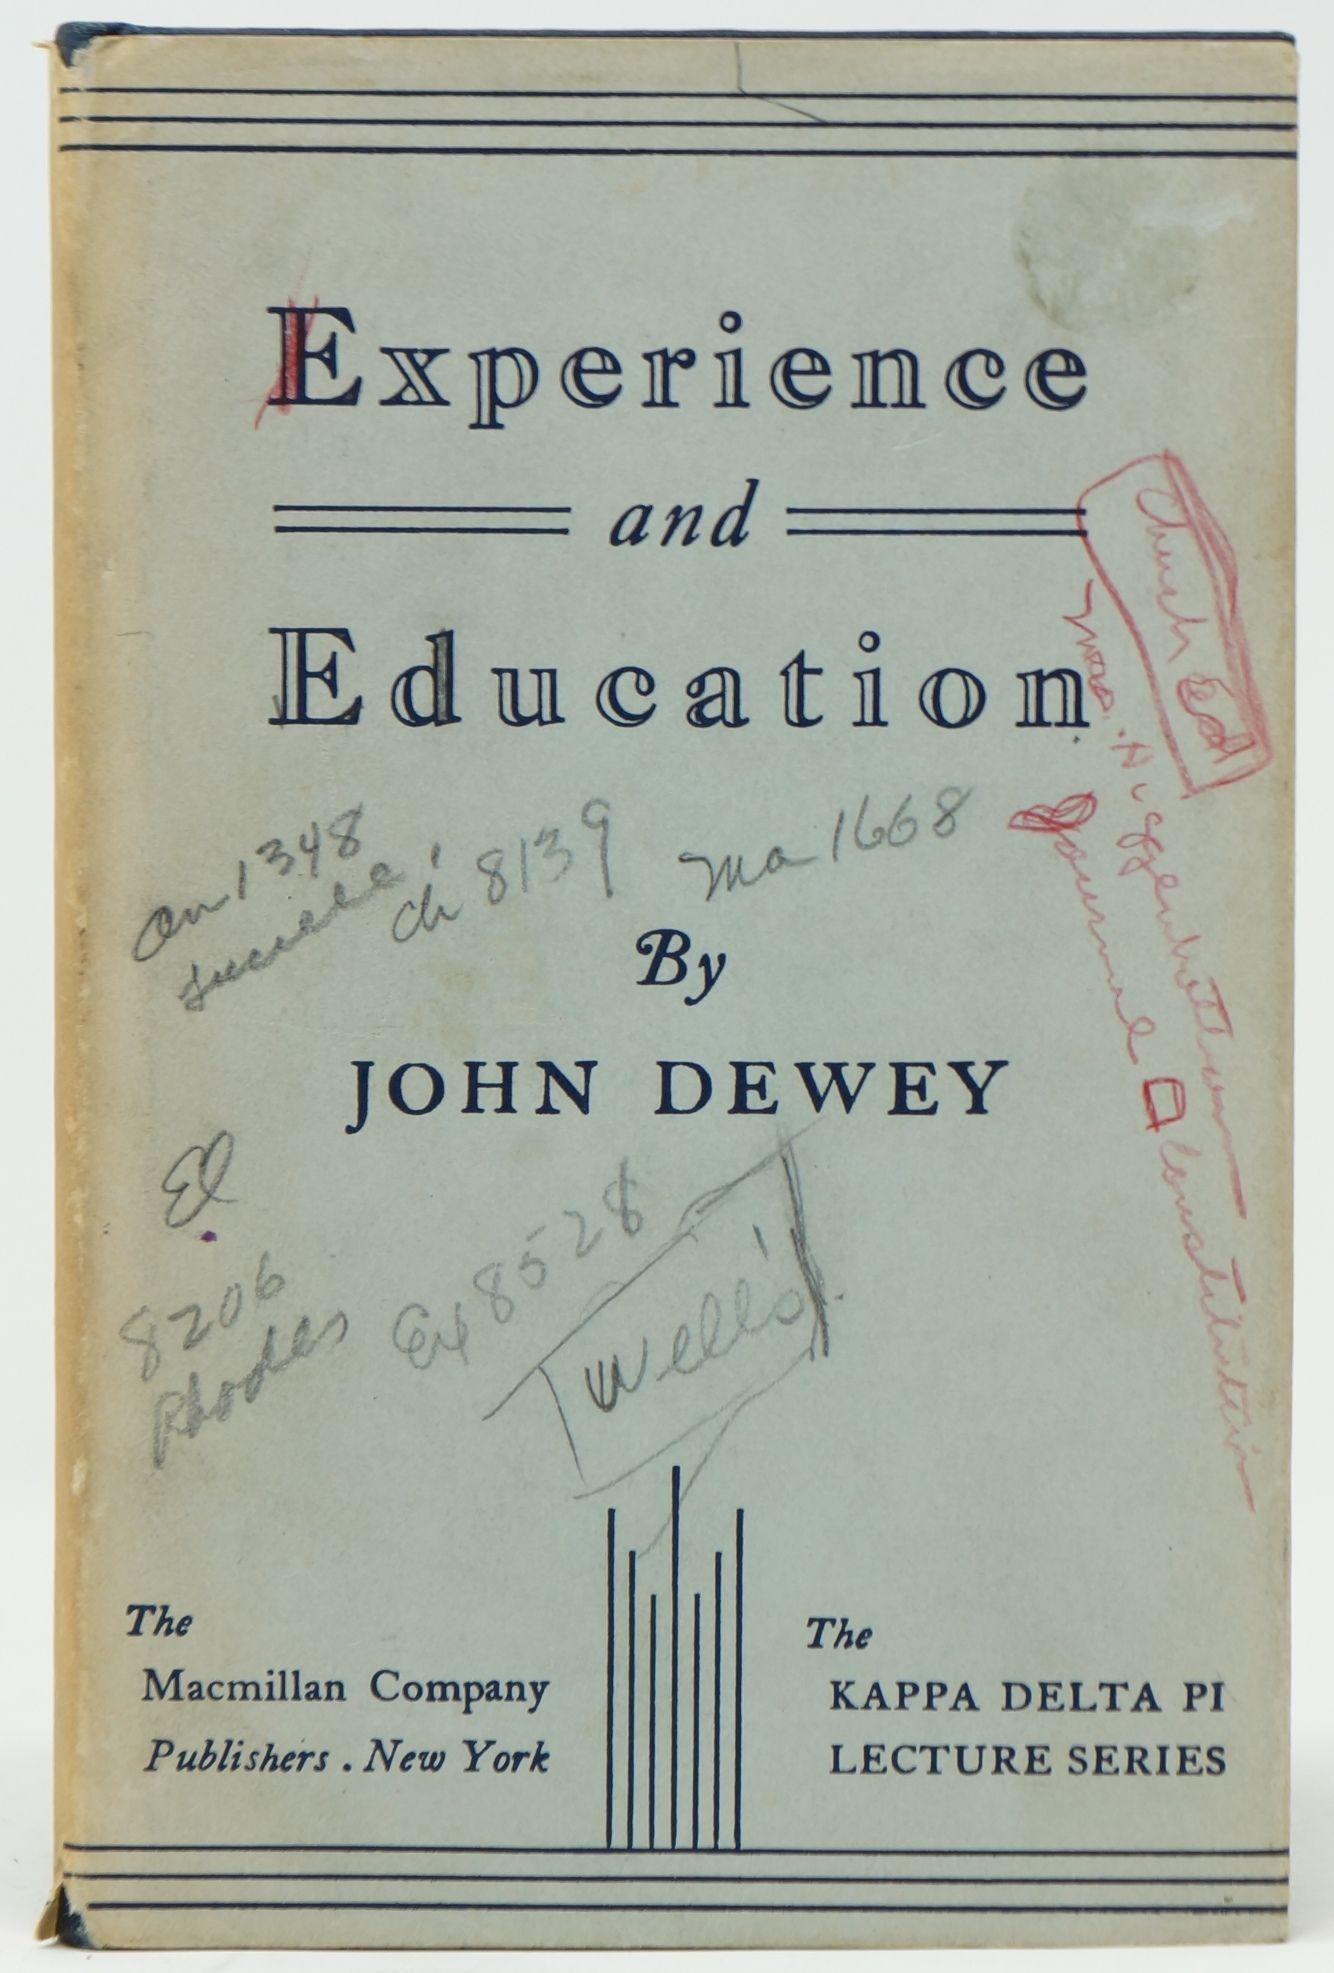 Experience And Education The Kappa Delta Pi Lecture Series By Dewey John New York The Macmillan Company 1954 Eighteenth Print Kappa Delta Lecture Kappa